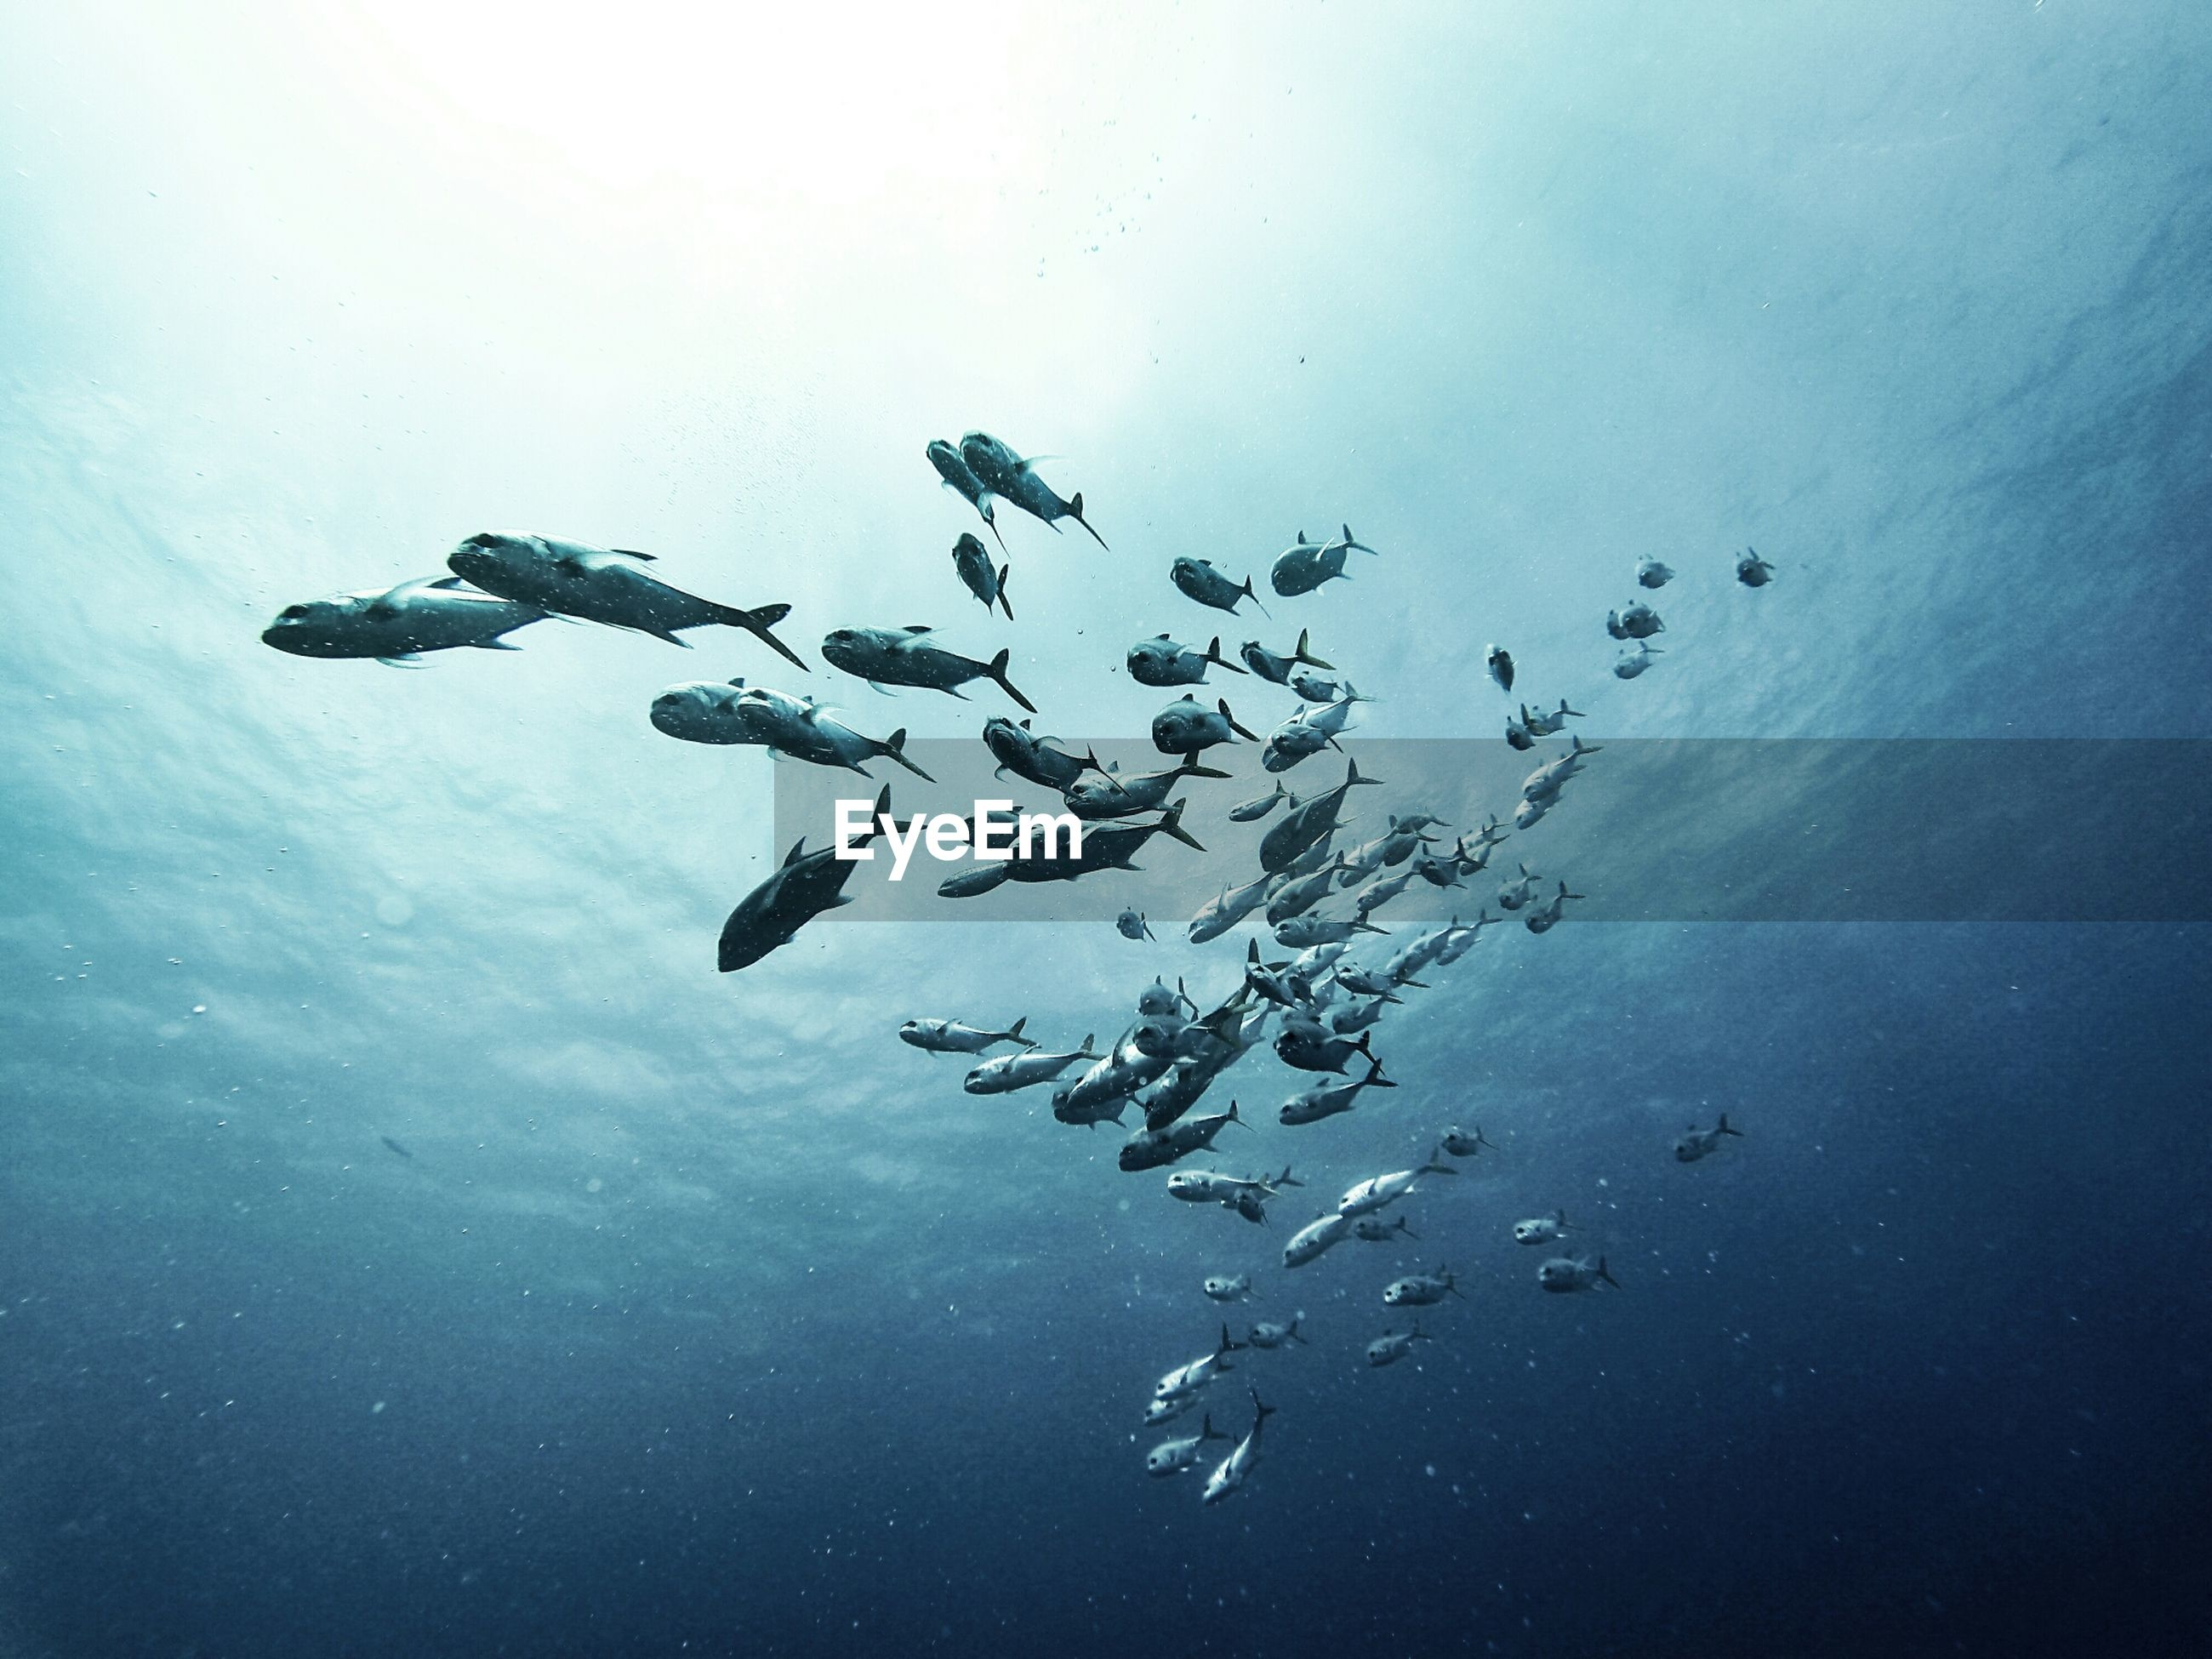 School of fish swimming in water